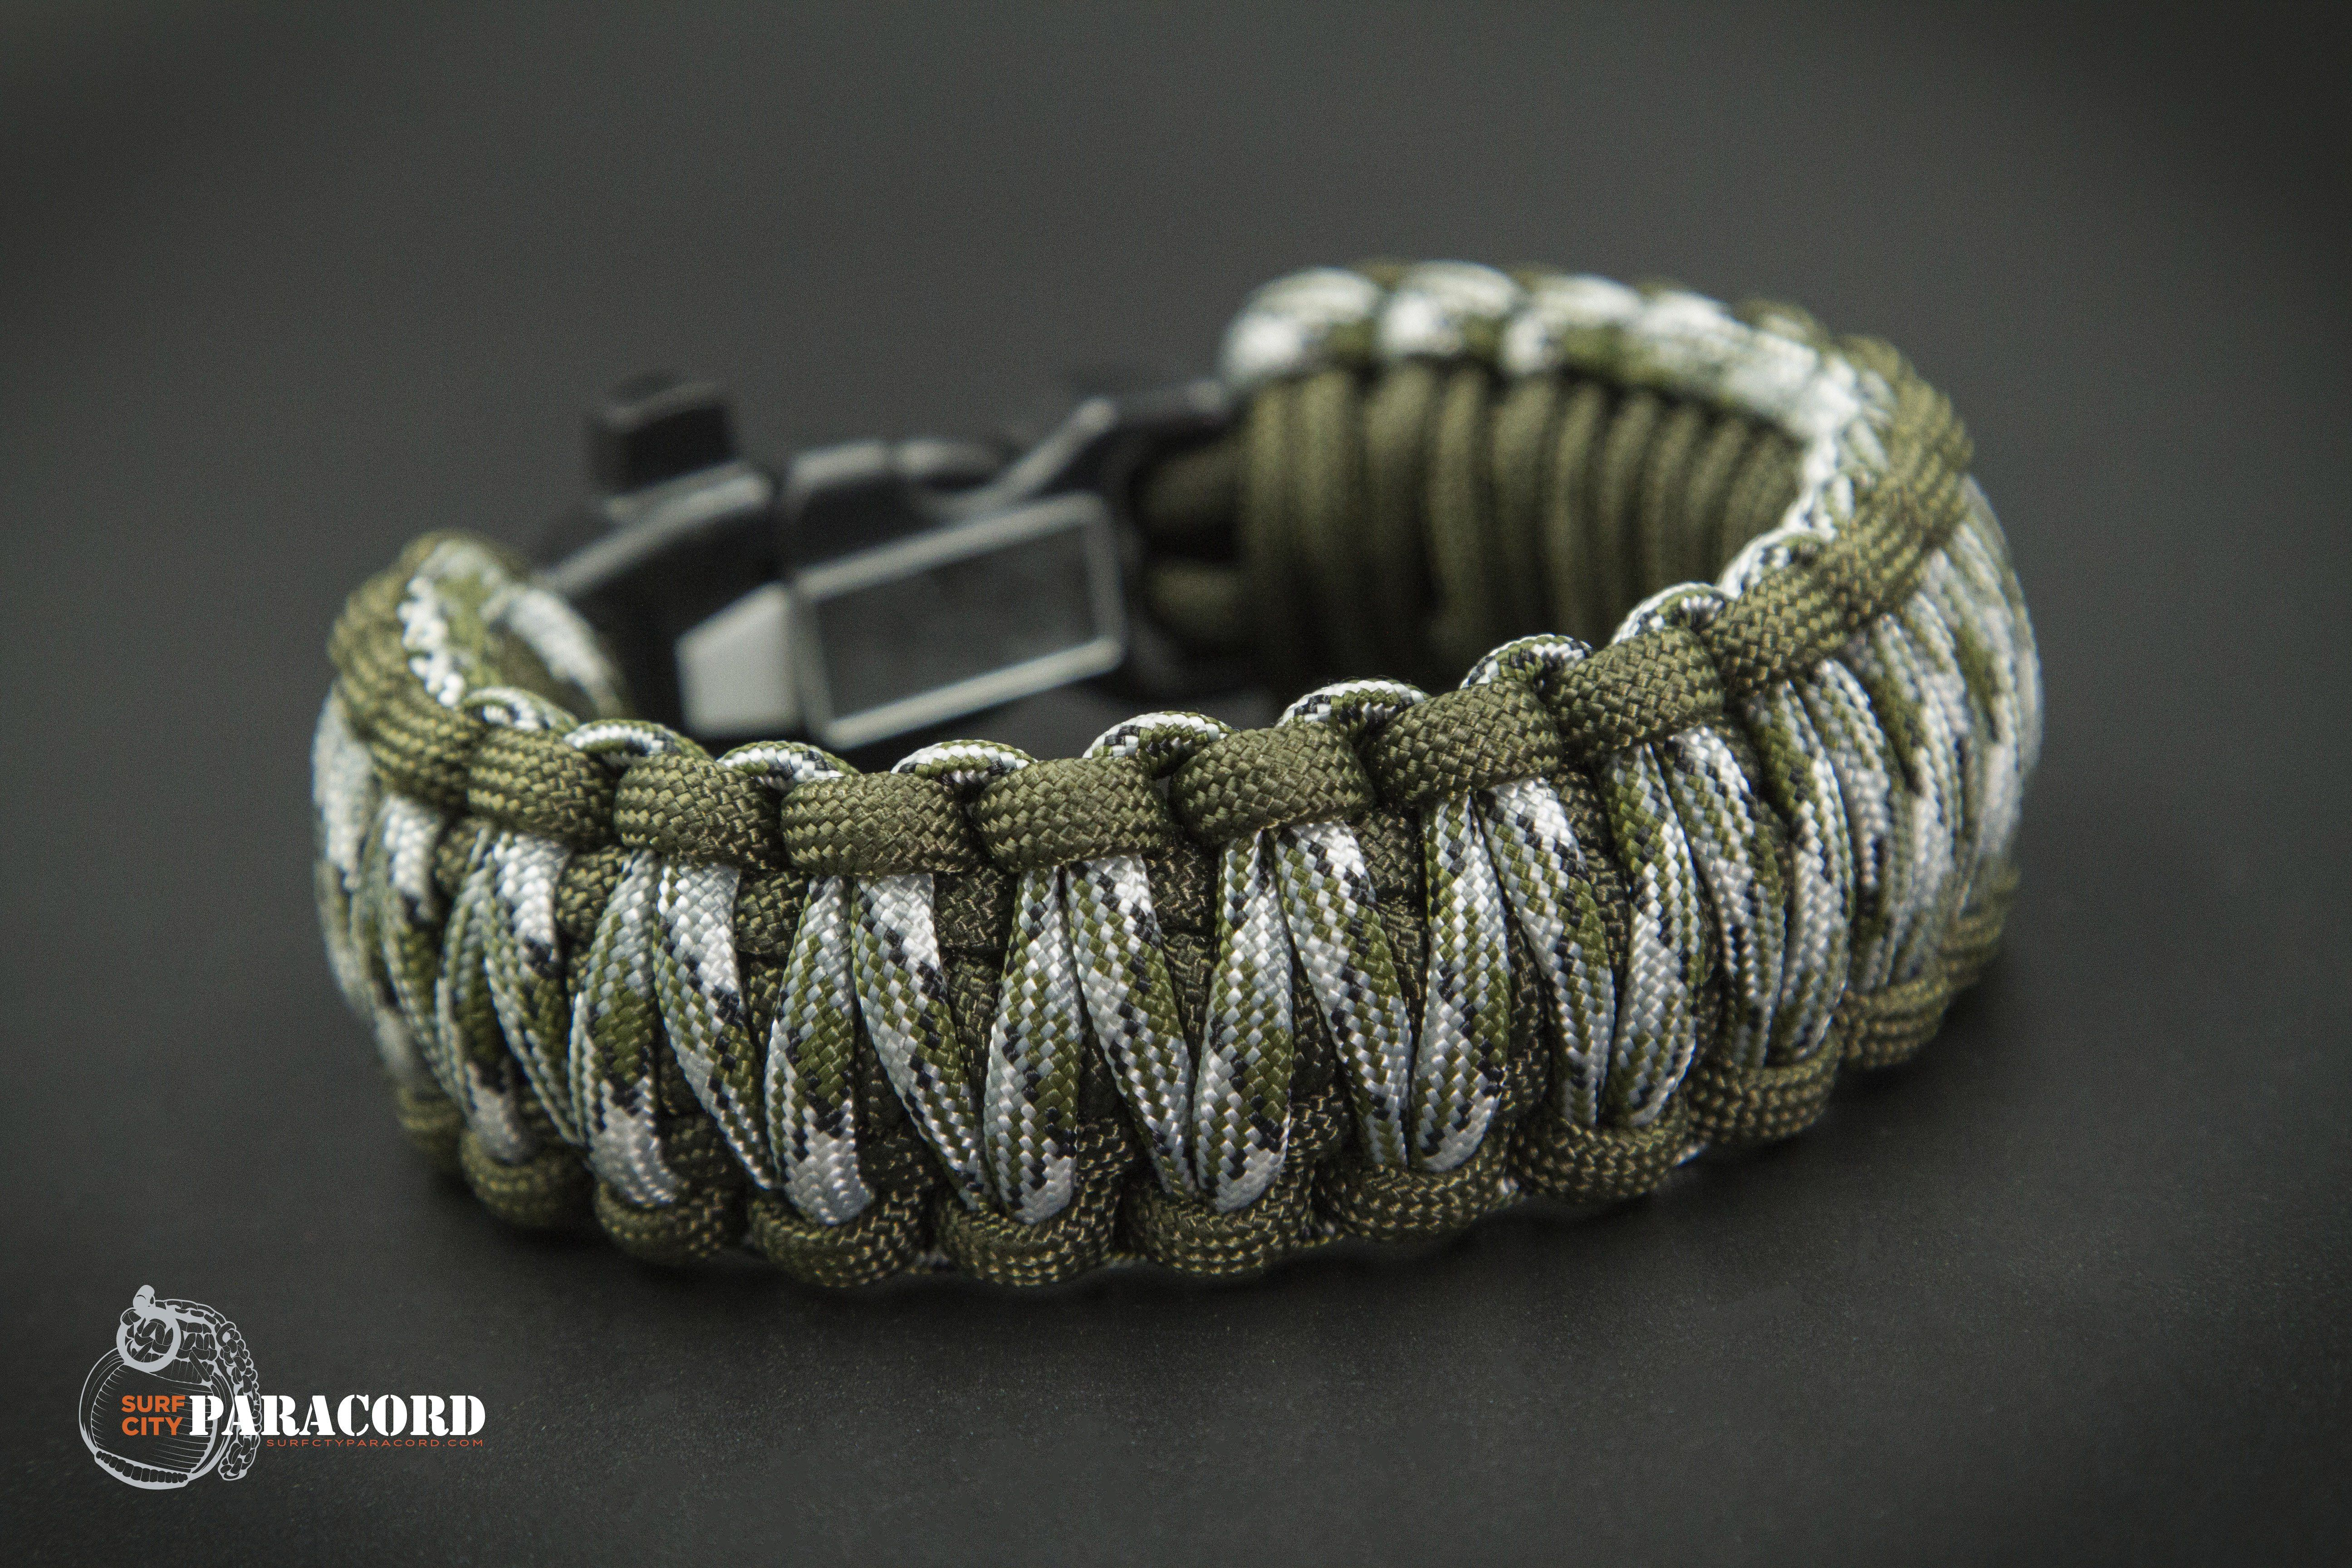 550 Paracord Survival Bracelet King Cobra Black//Purple Camping Tactical Military